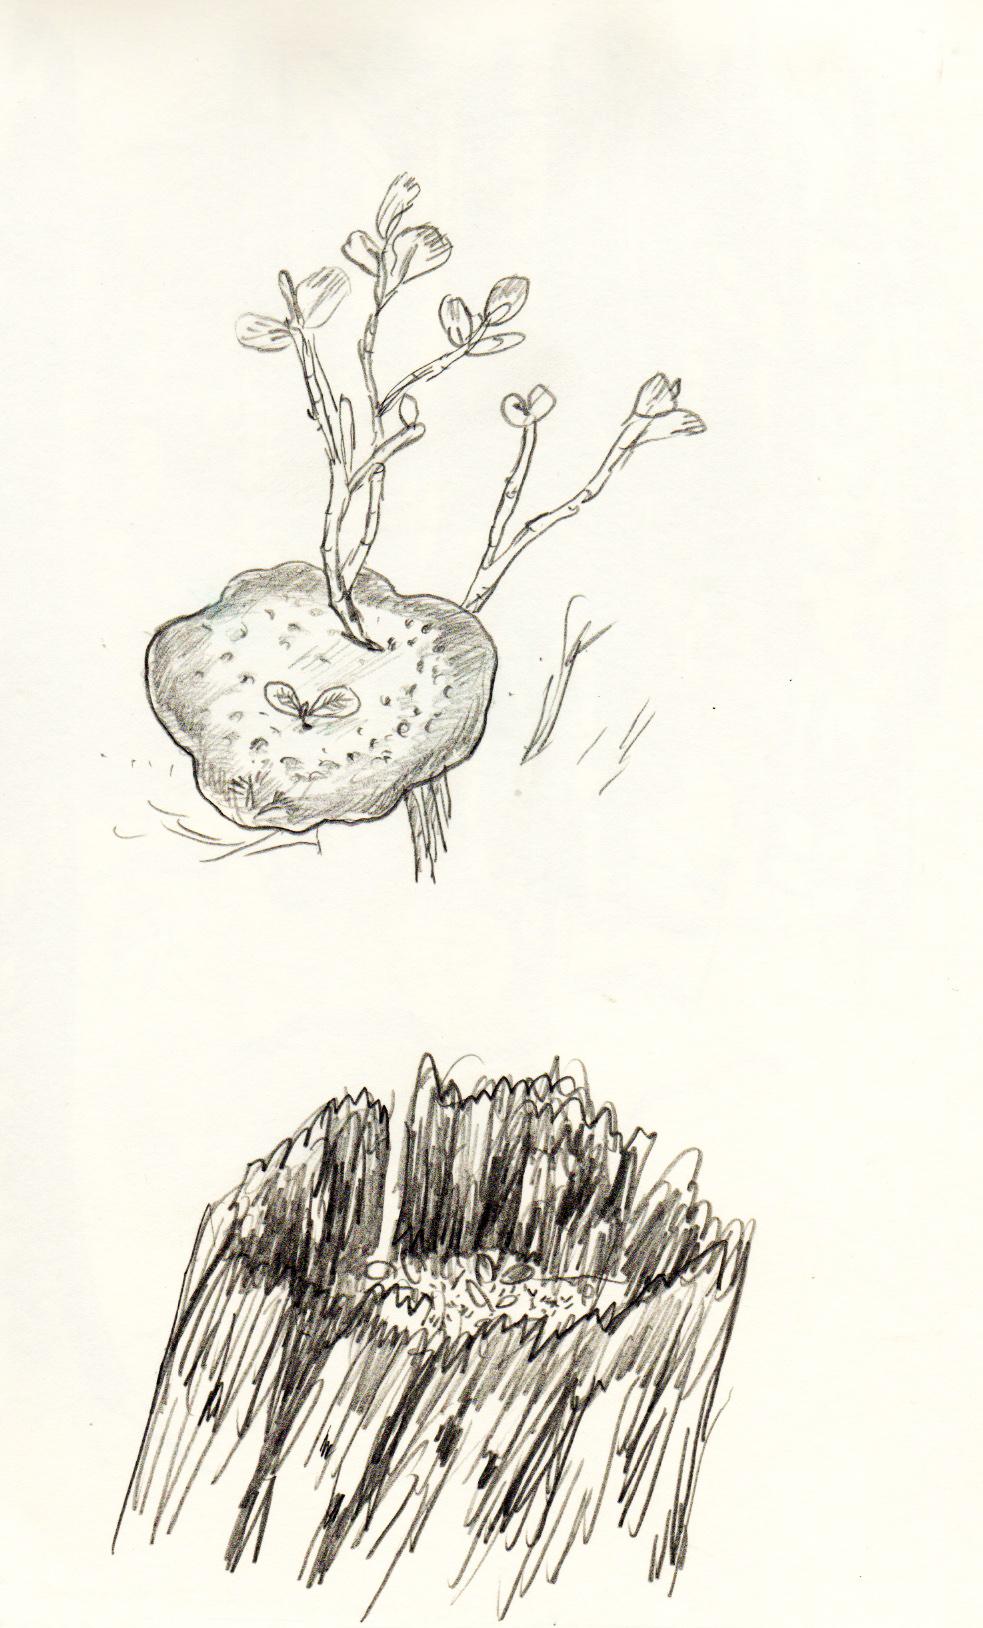 champignon ete 2011.jpeg